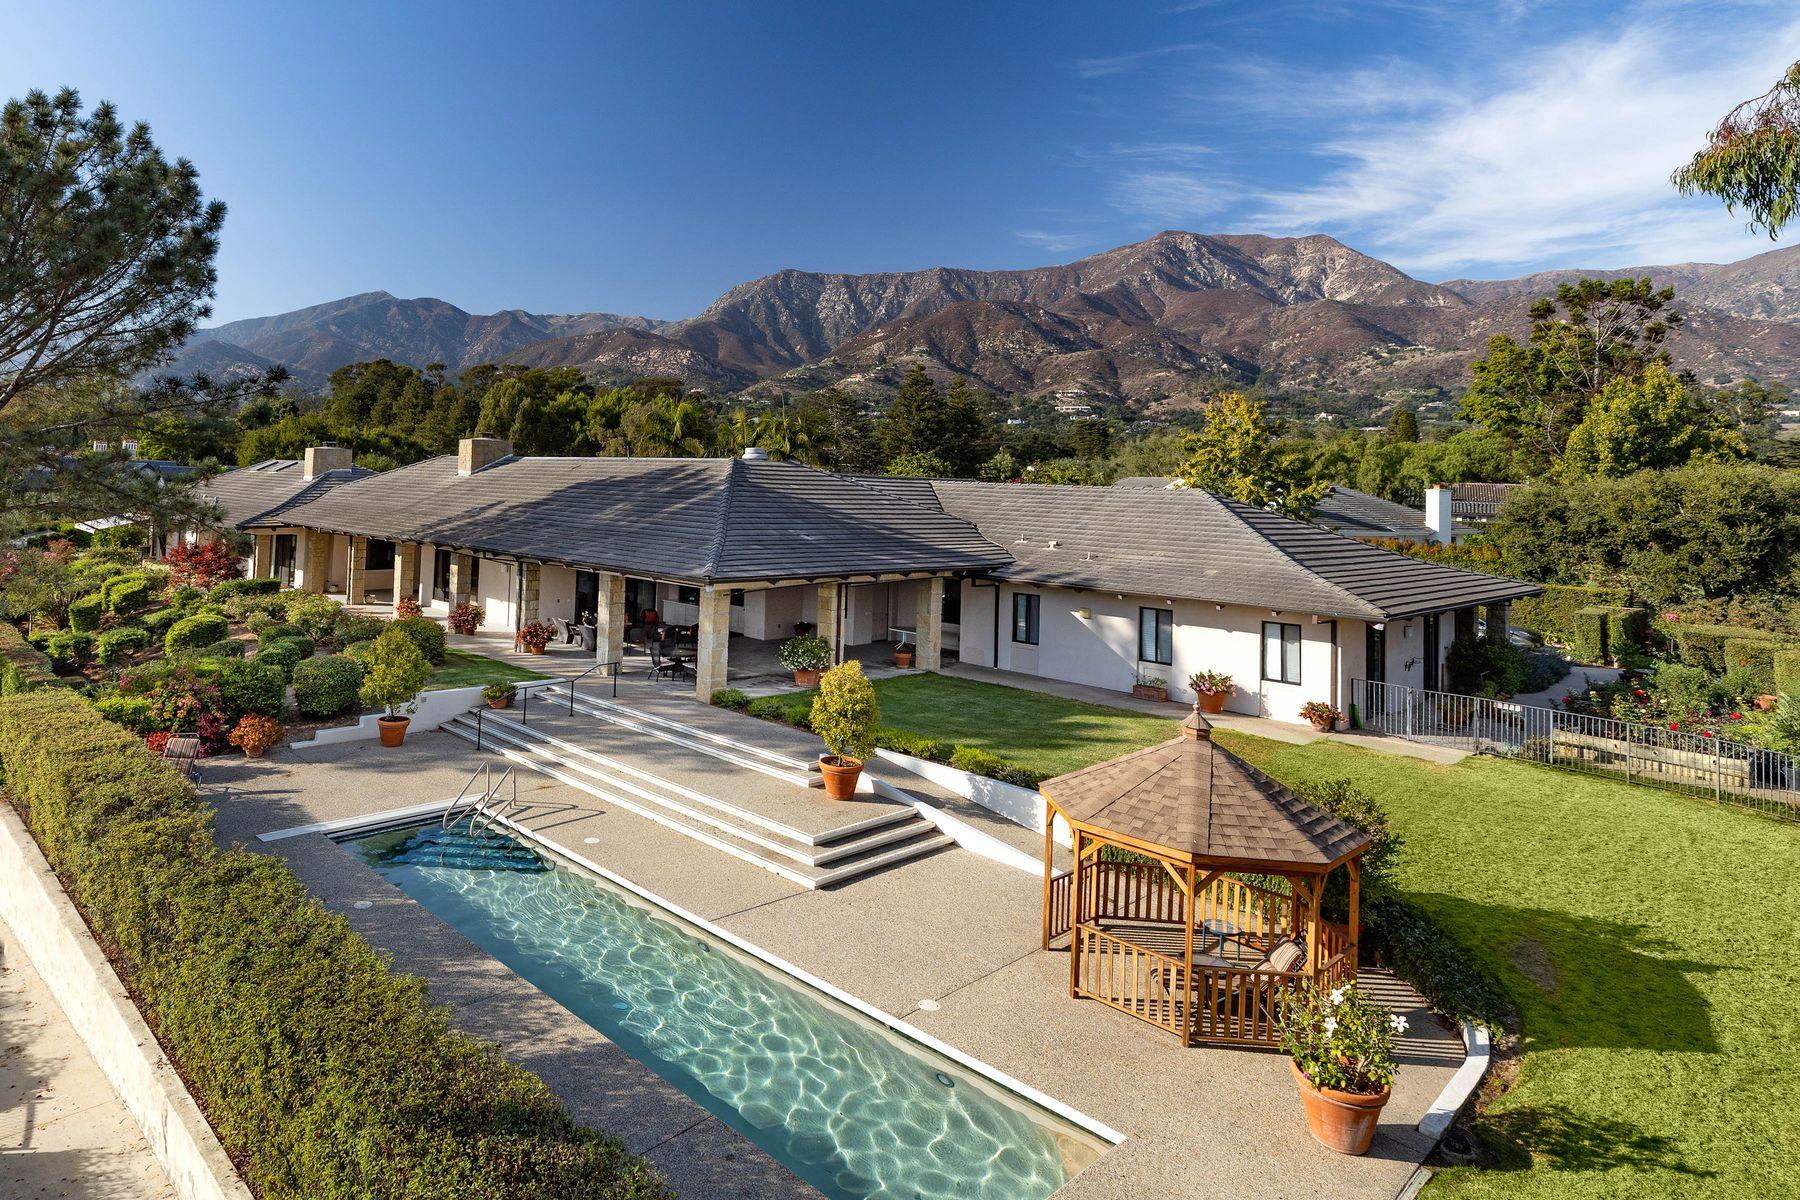 Single Family Homes for Sale at Premier Birnam Wood Golf Club Home 1185 Fife Lane Montecito, California 93108 United States